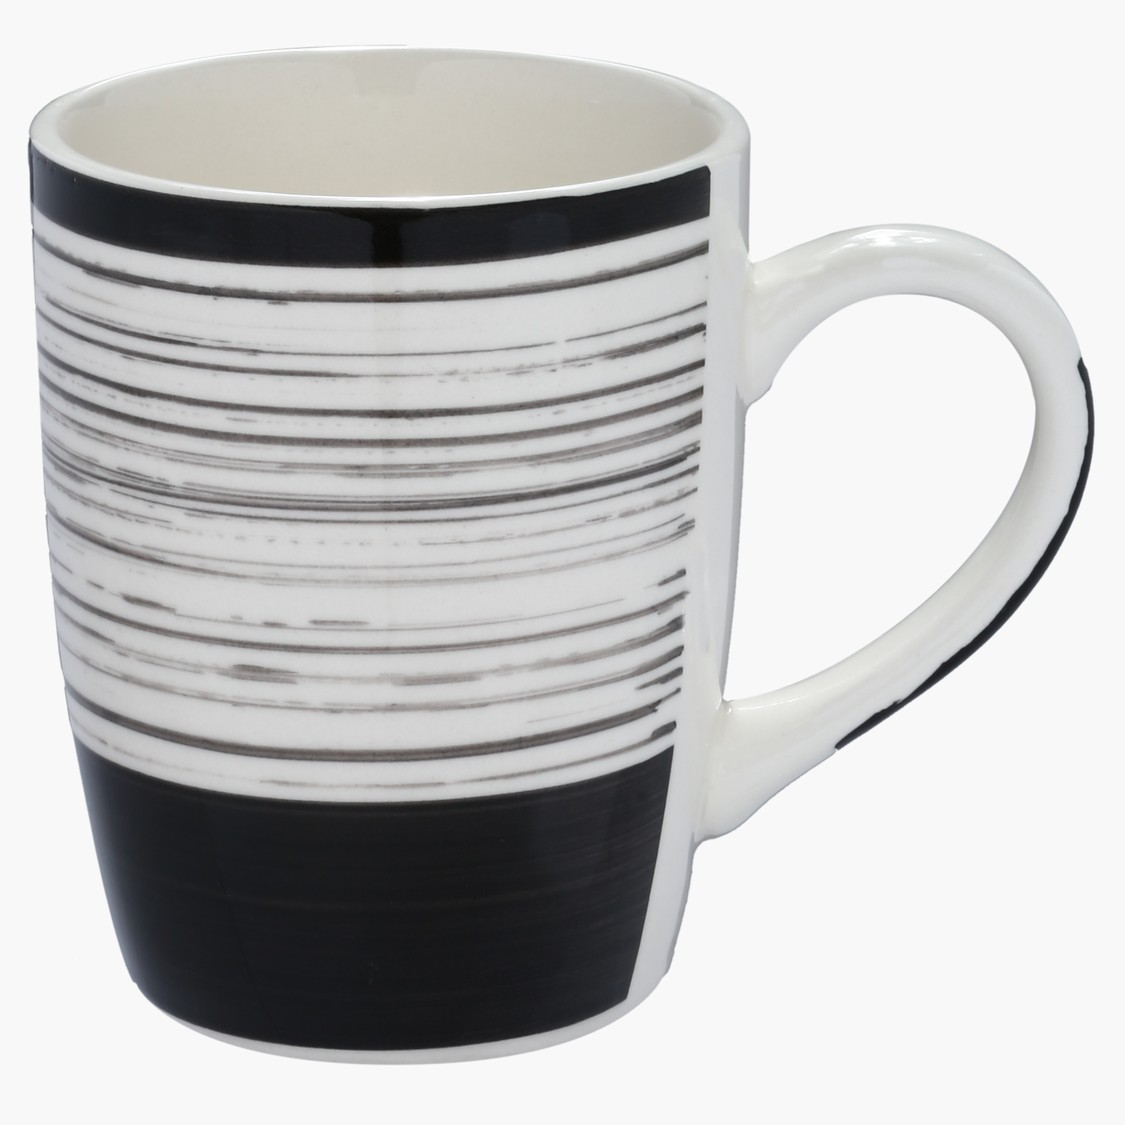 Printed Mug with Sturdy Handle